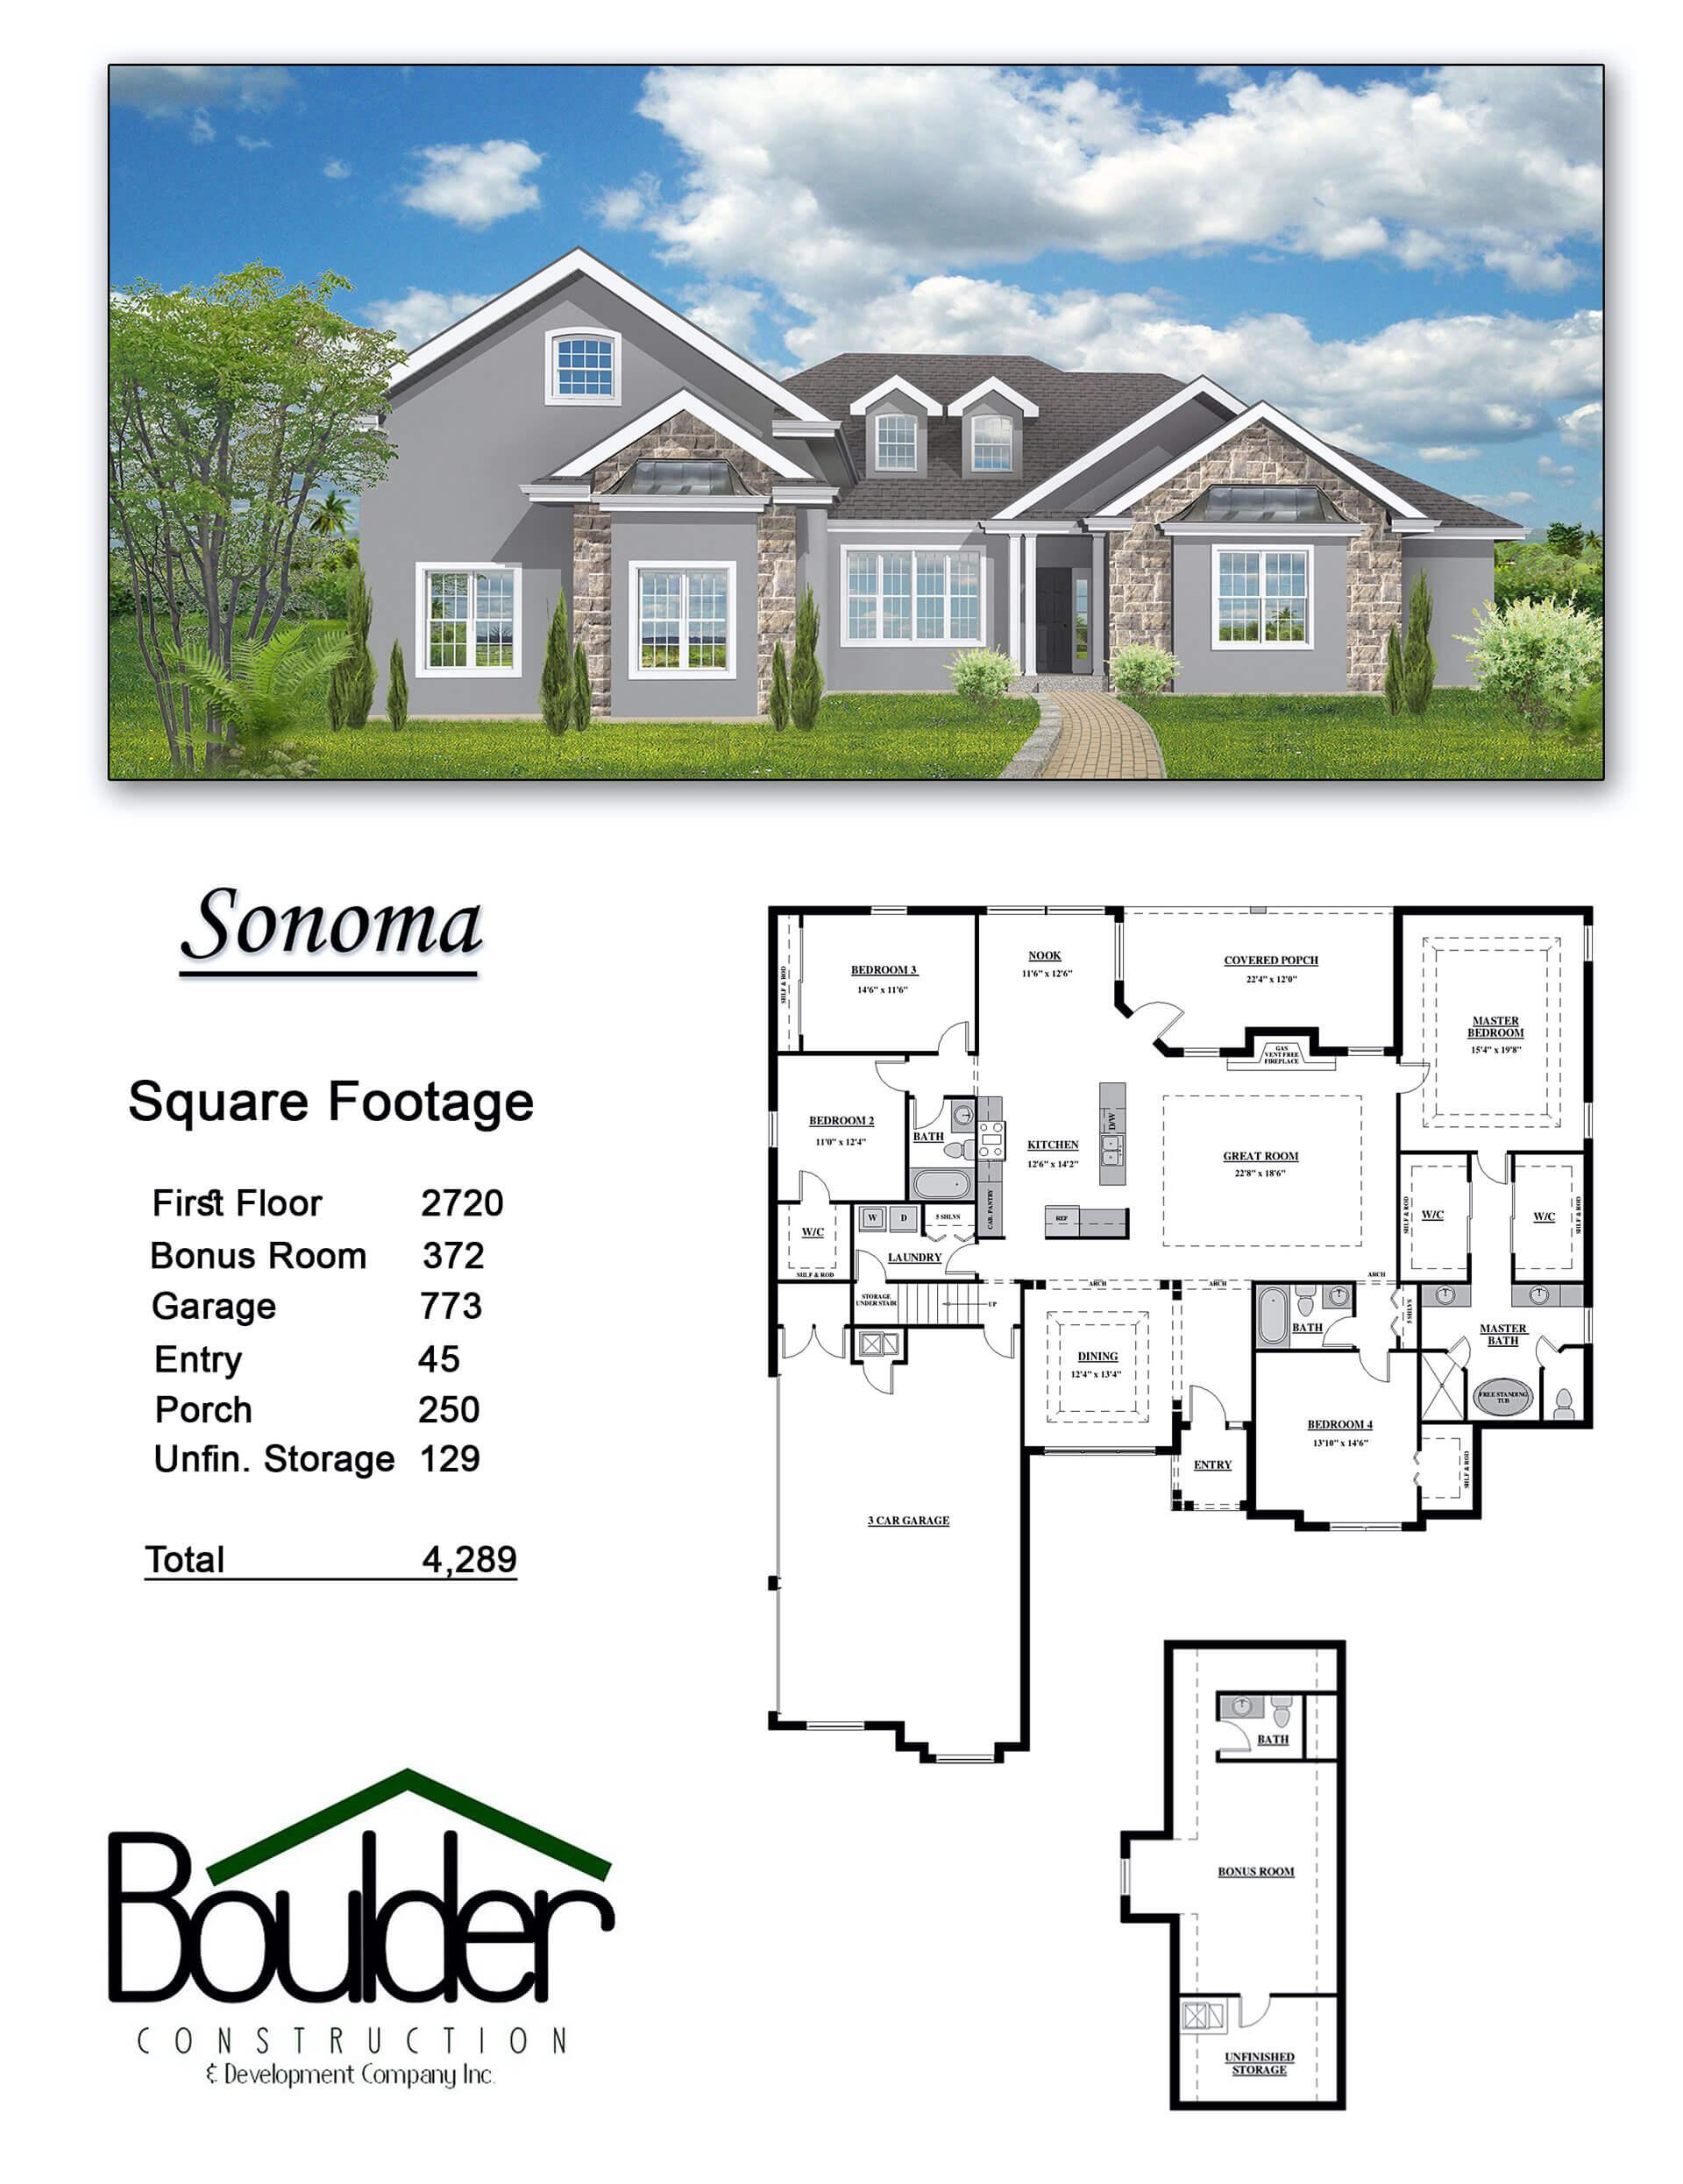 boulder-construction-sonoma-floor-plan